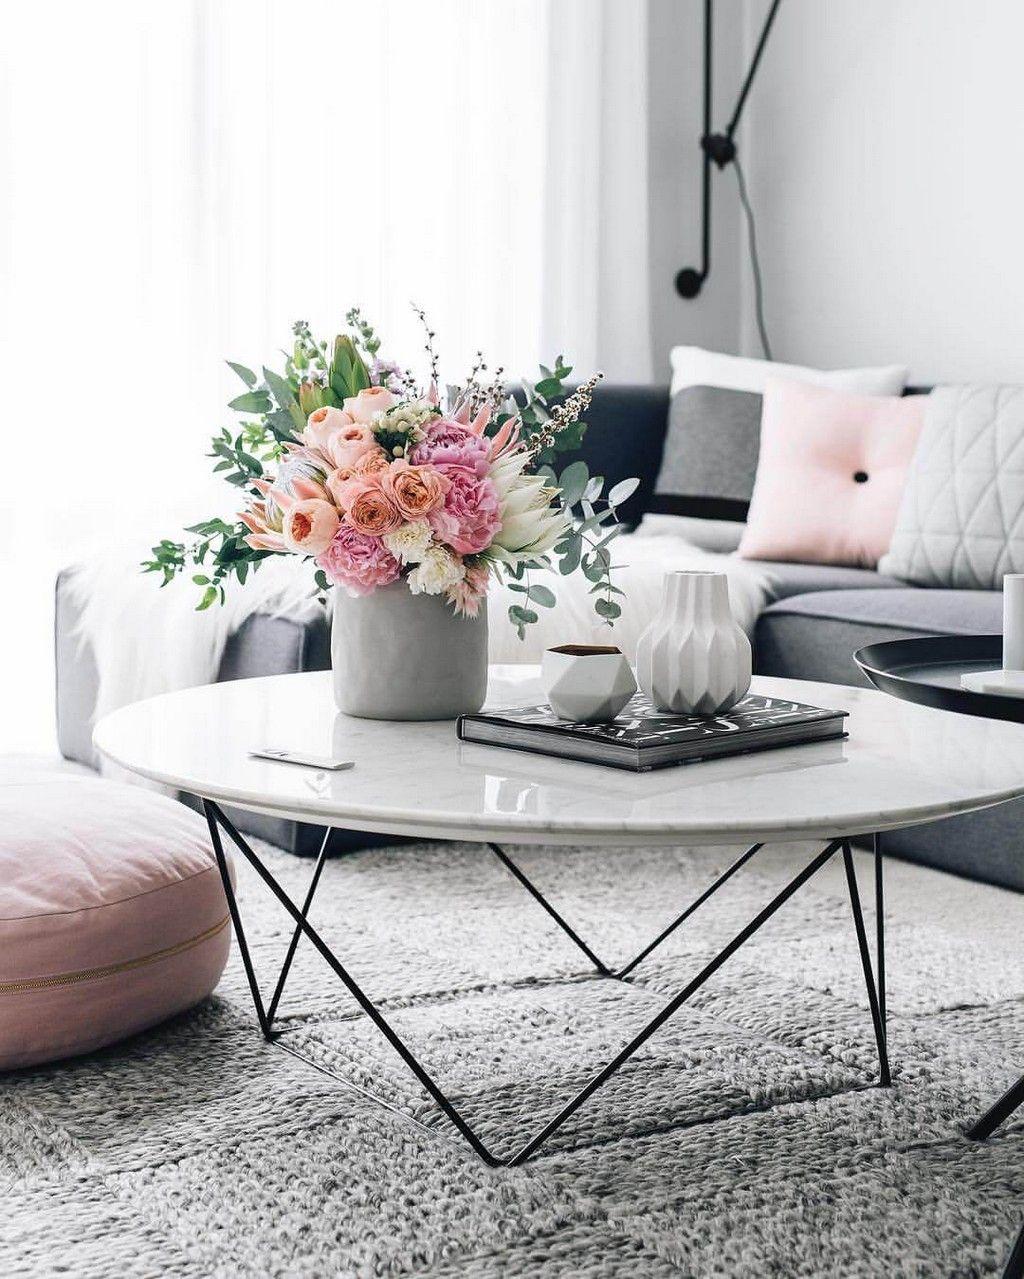 Walmart Living Room Decor Color Scheme Rancak Id Living Decor Coffee Table Decor Walmart living room decor